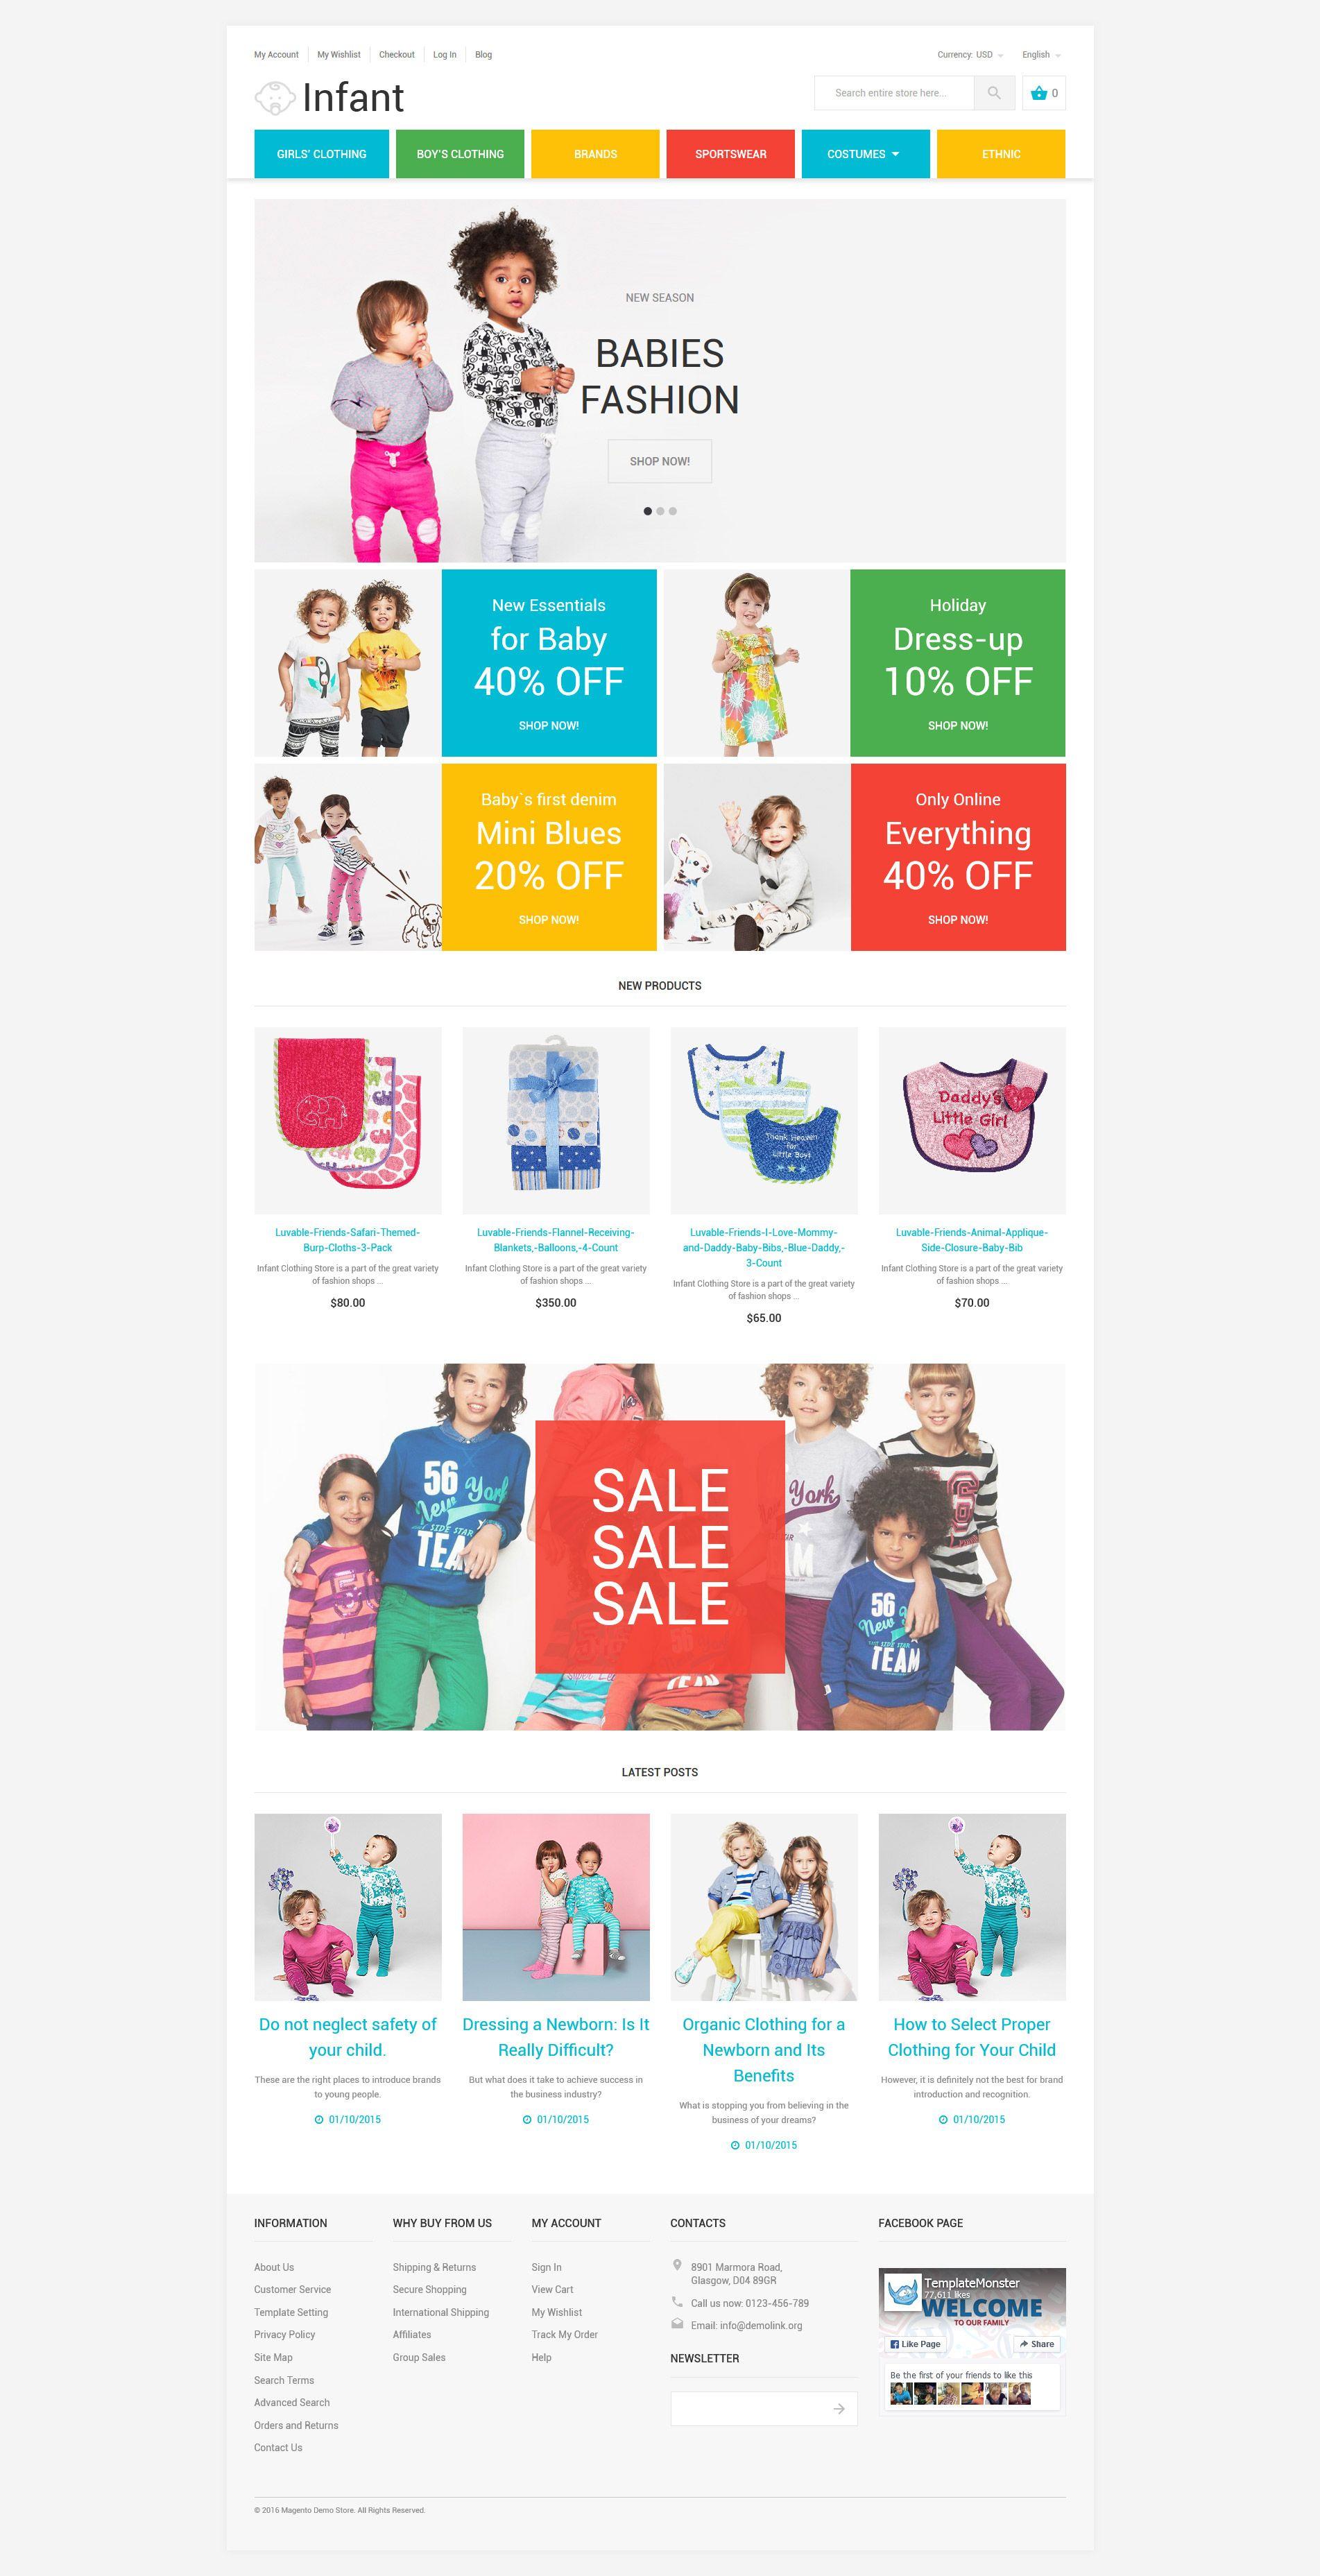 Infant magento theme new website templates pinterest babies baby store responsive magento theme 58581 httptemplatemonster magento themesbaby store responsive magento theme 58581ml maxwellsz